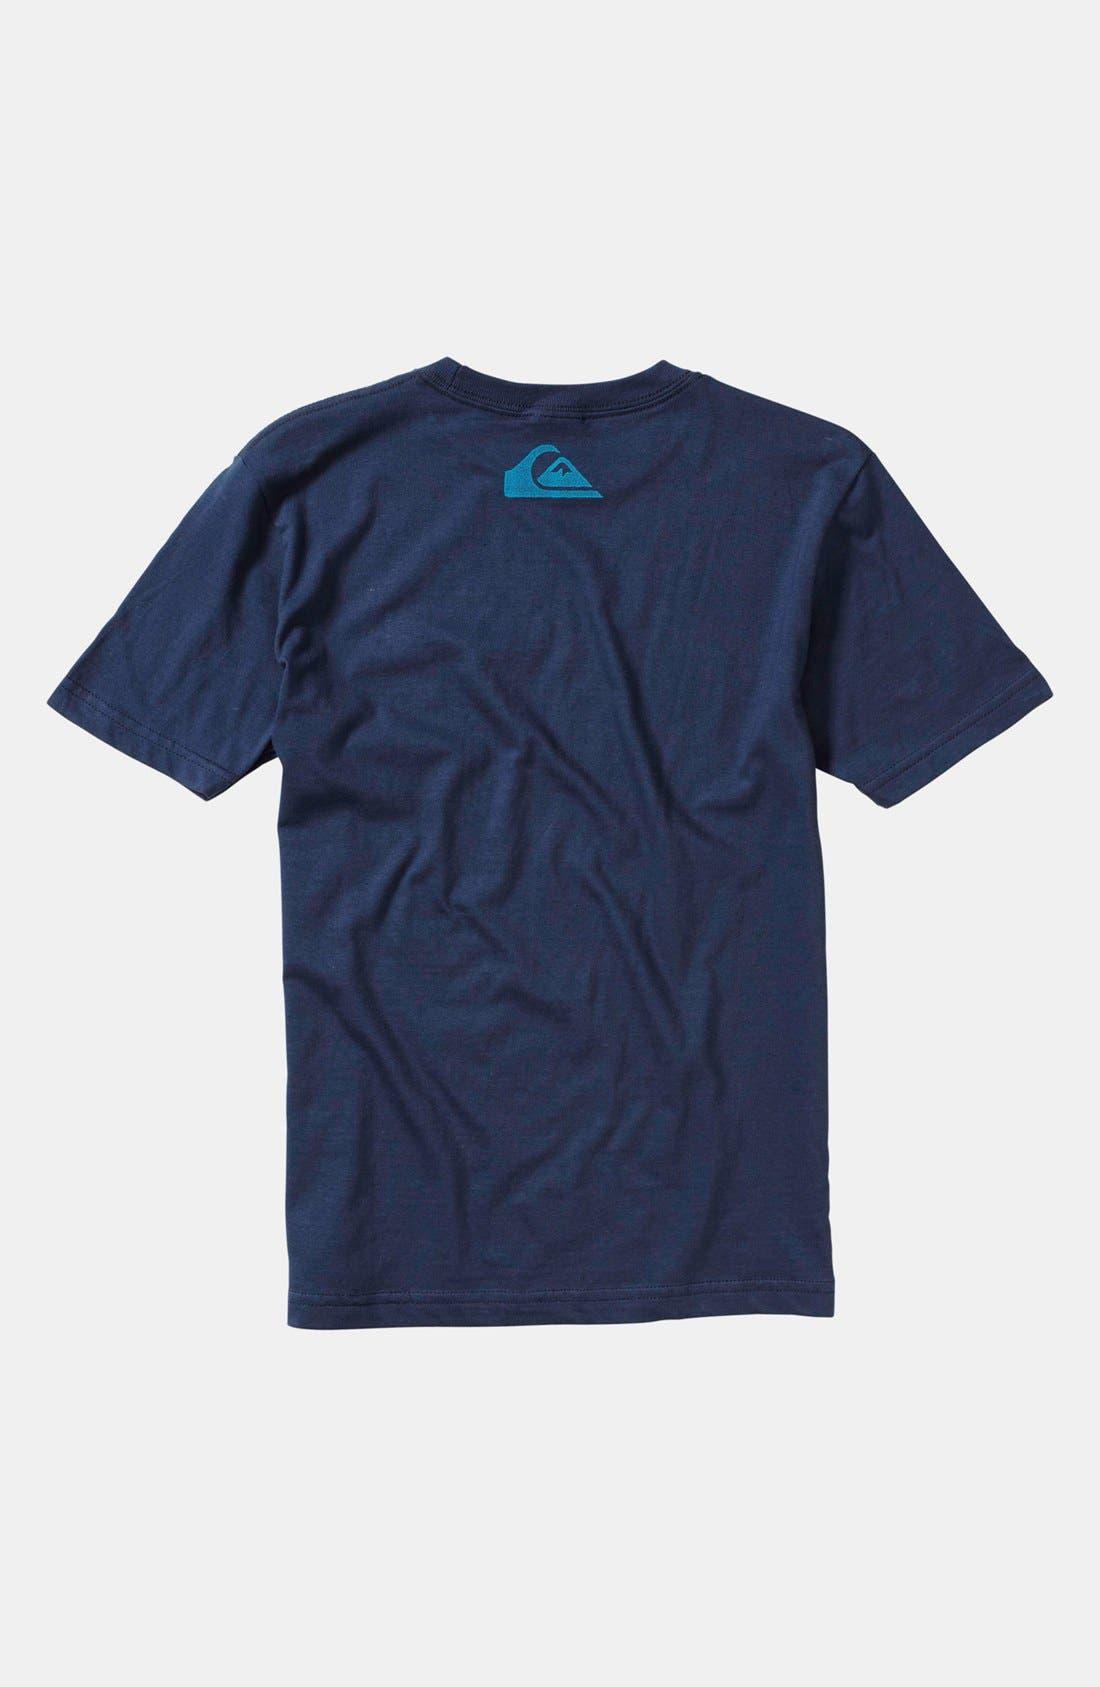 Alternate Image 2  - Quiksilver 'Simplifier' T-Shirt (Toddler Boys)